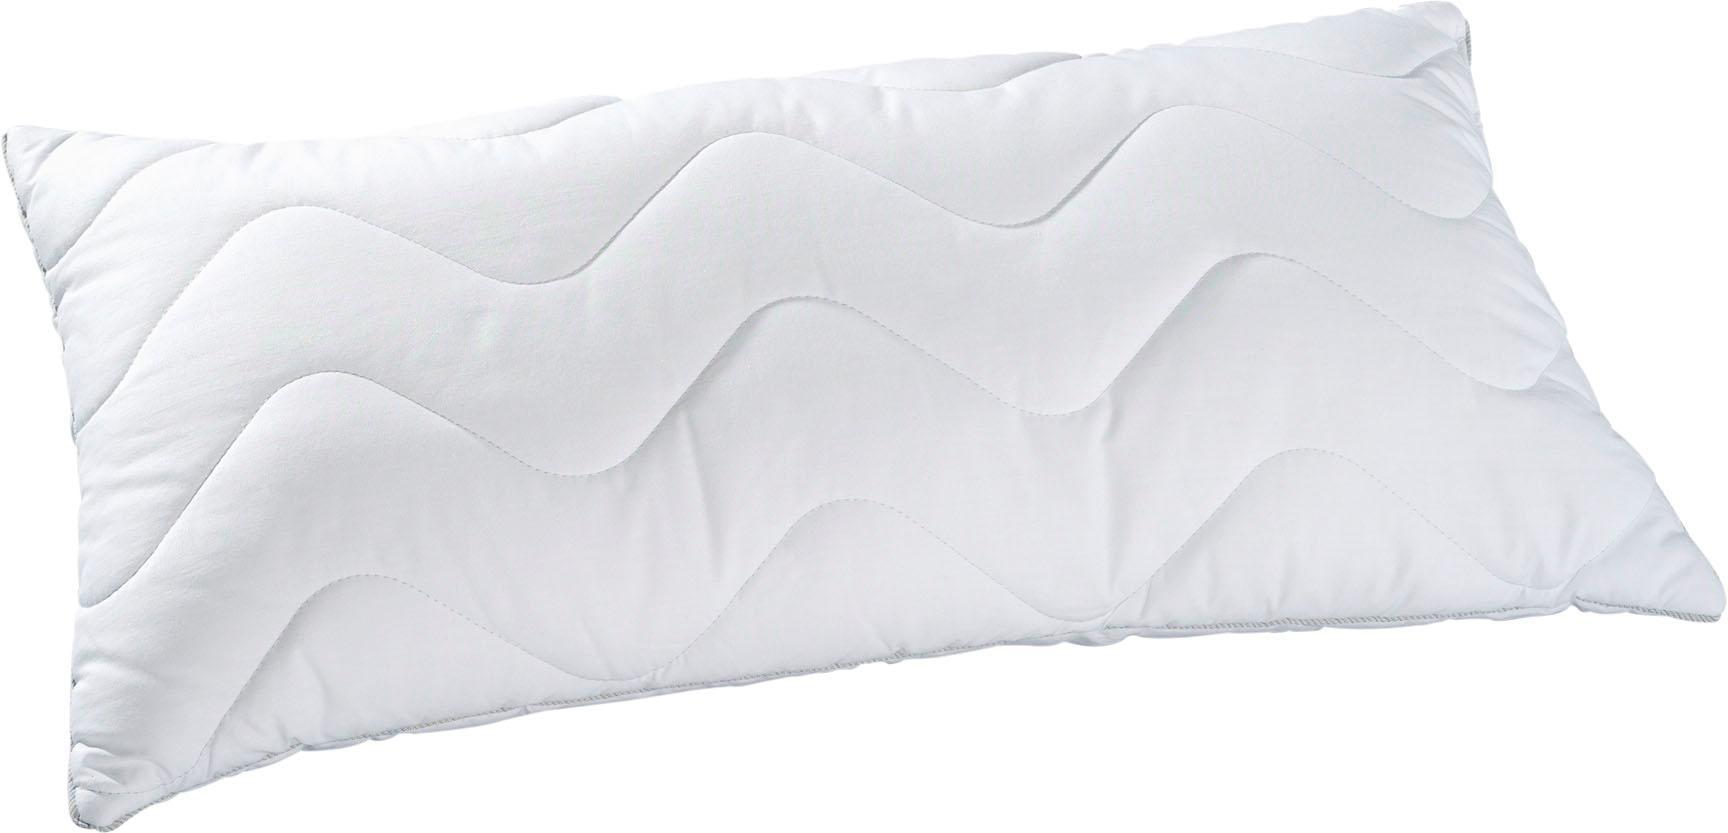 Synthetikkopfkissen Body Soft Kopfkissen KBT Bettwaren